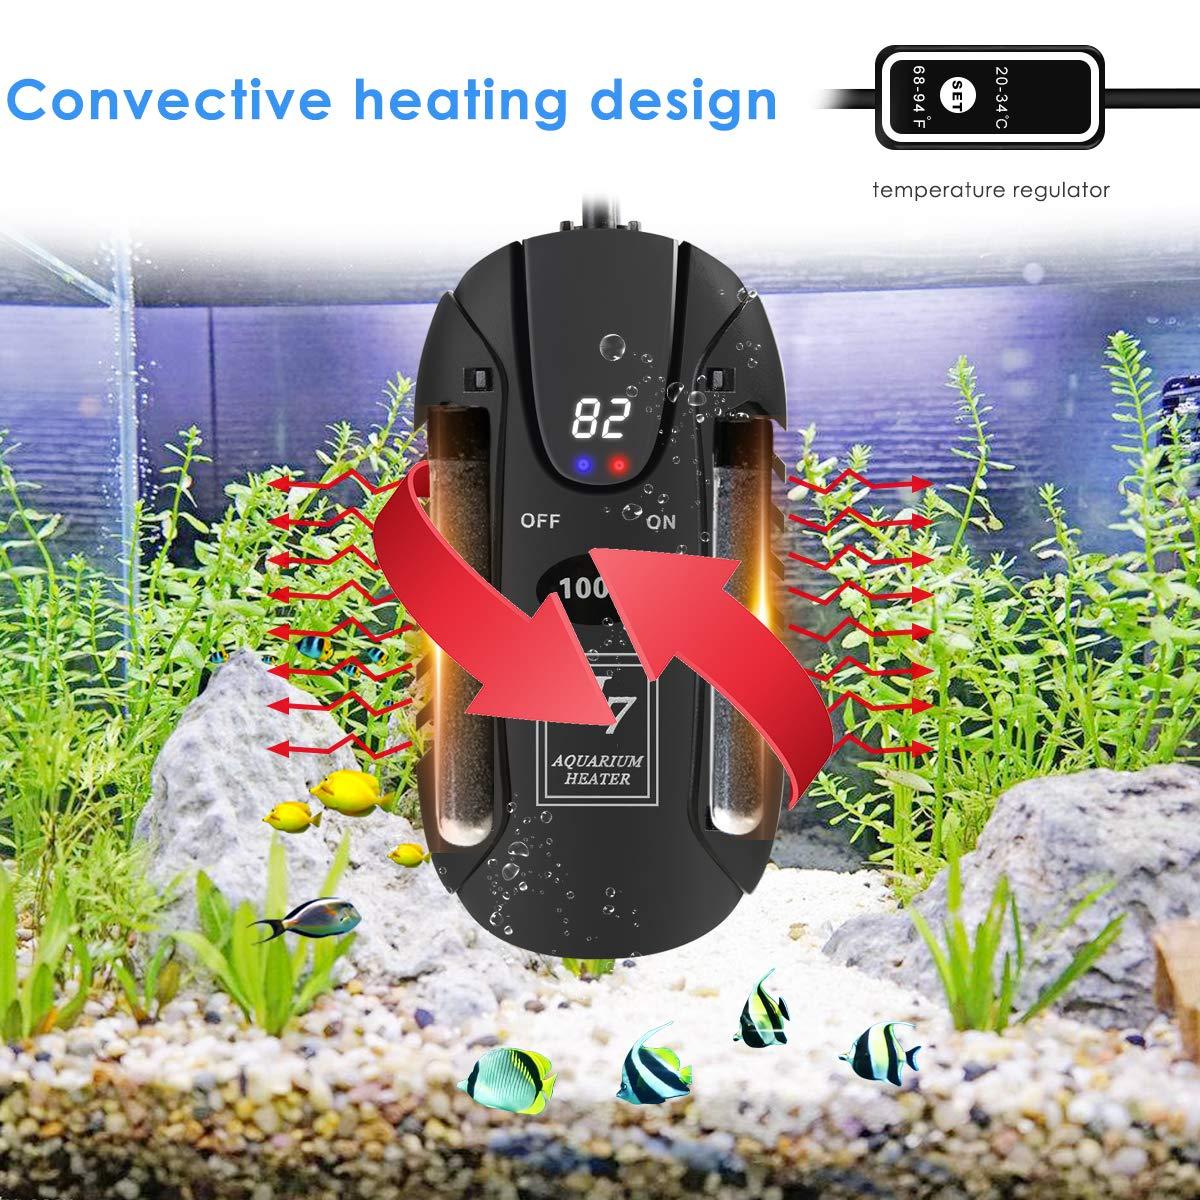 100W Mini Fish Tank Heaters Submersible Aquarium Heater LED Aquarium Fish Tank heater Fish Tank Heater with LED Temperature Display /& External Temperature Controller for Aquarium Glass Fish Tank Turtle Tank 5//10//25 Gallon Submersible Aquarium Heater